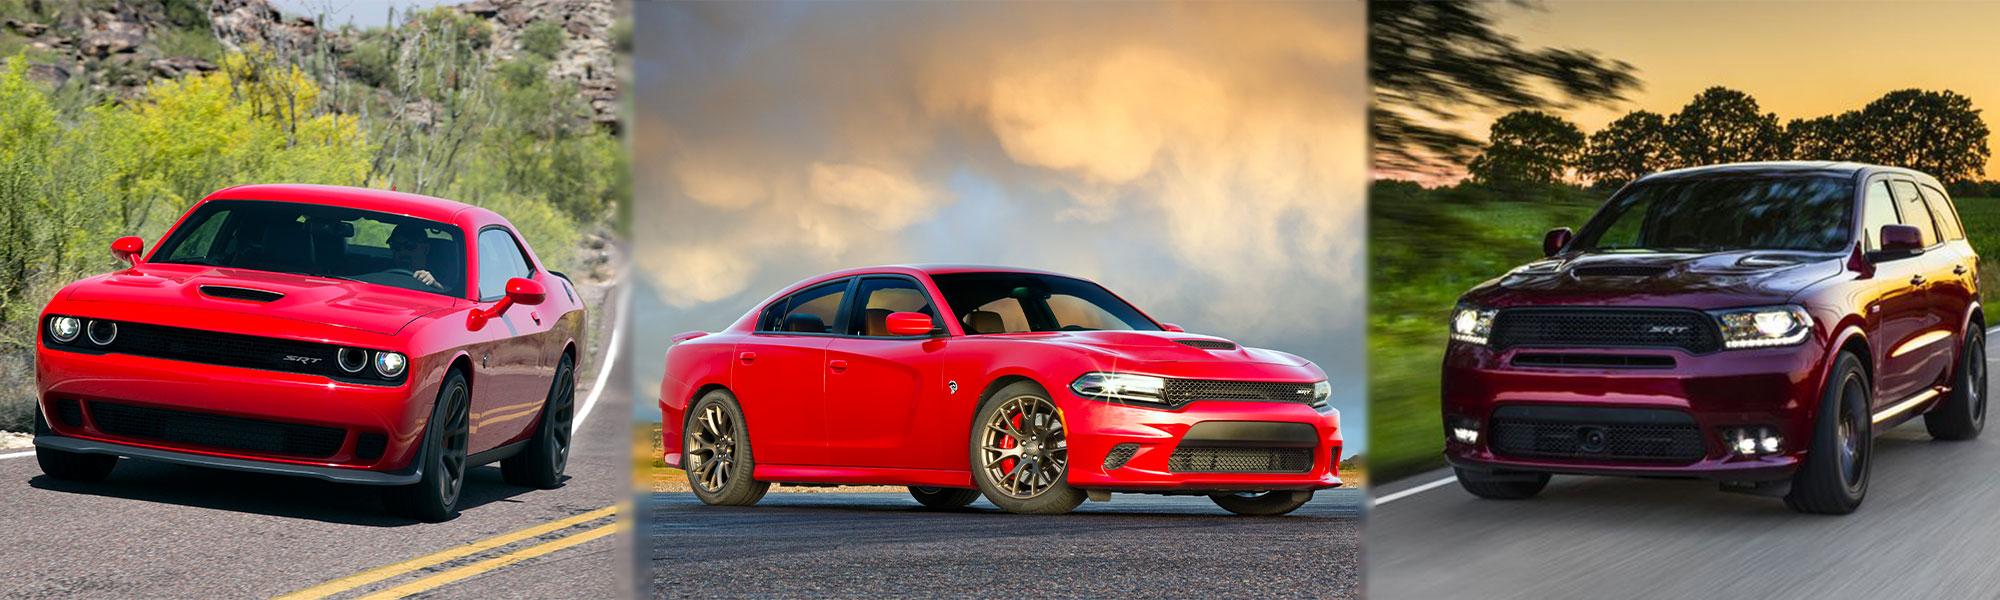 2020 Dodge SRT